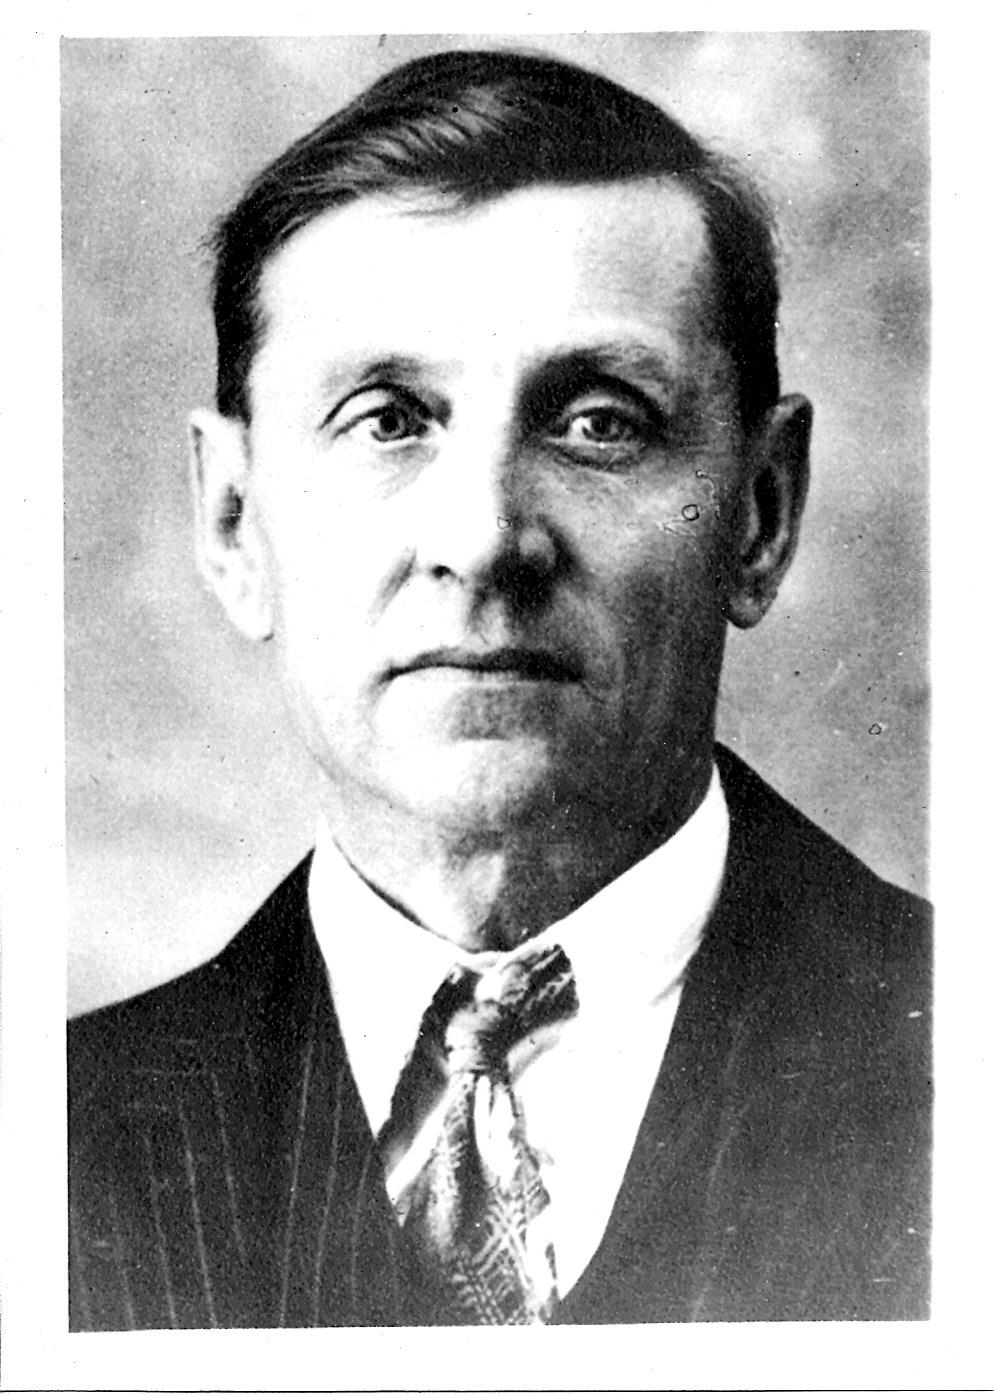 Stjepan Novoselac